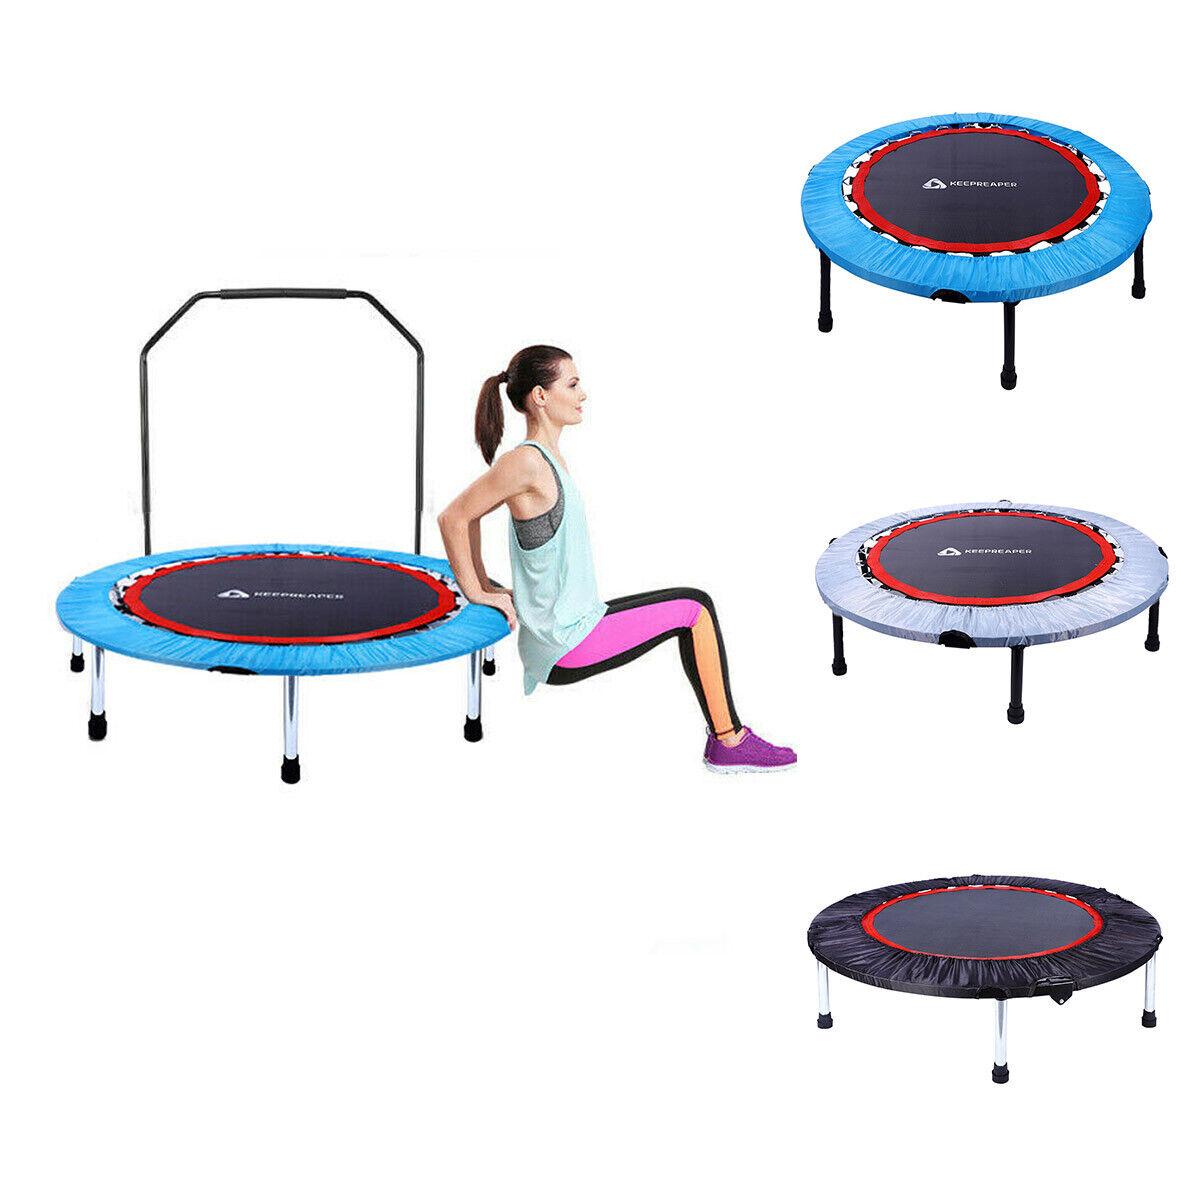 "40"" Mini Rebounder Trampoline Exercise Fitness Gym Jump Trai"